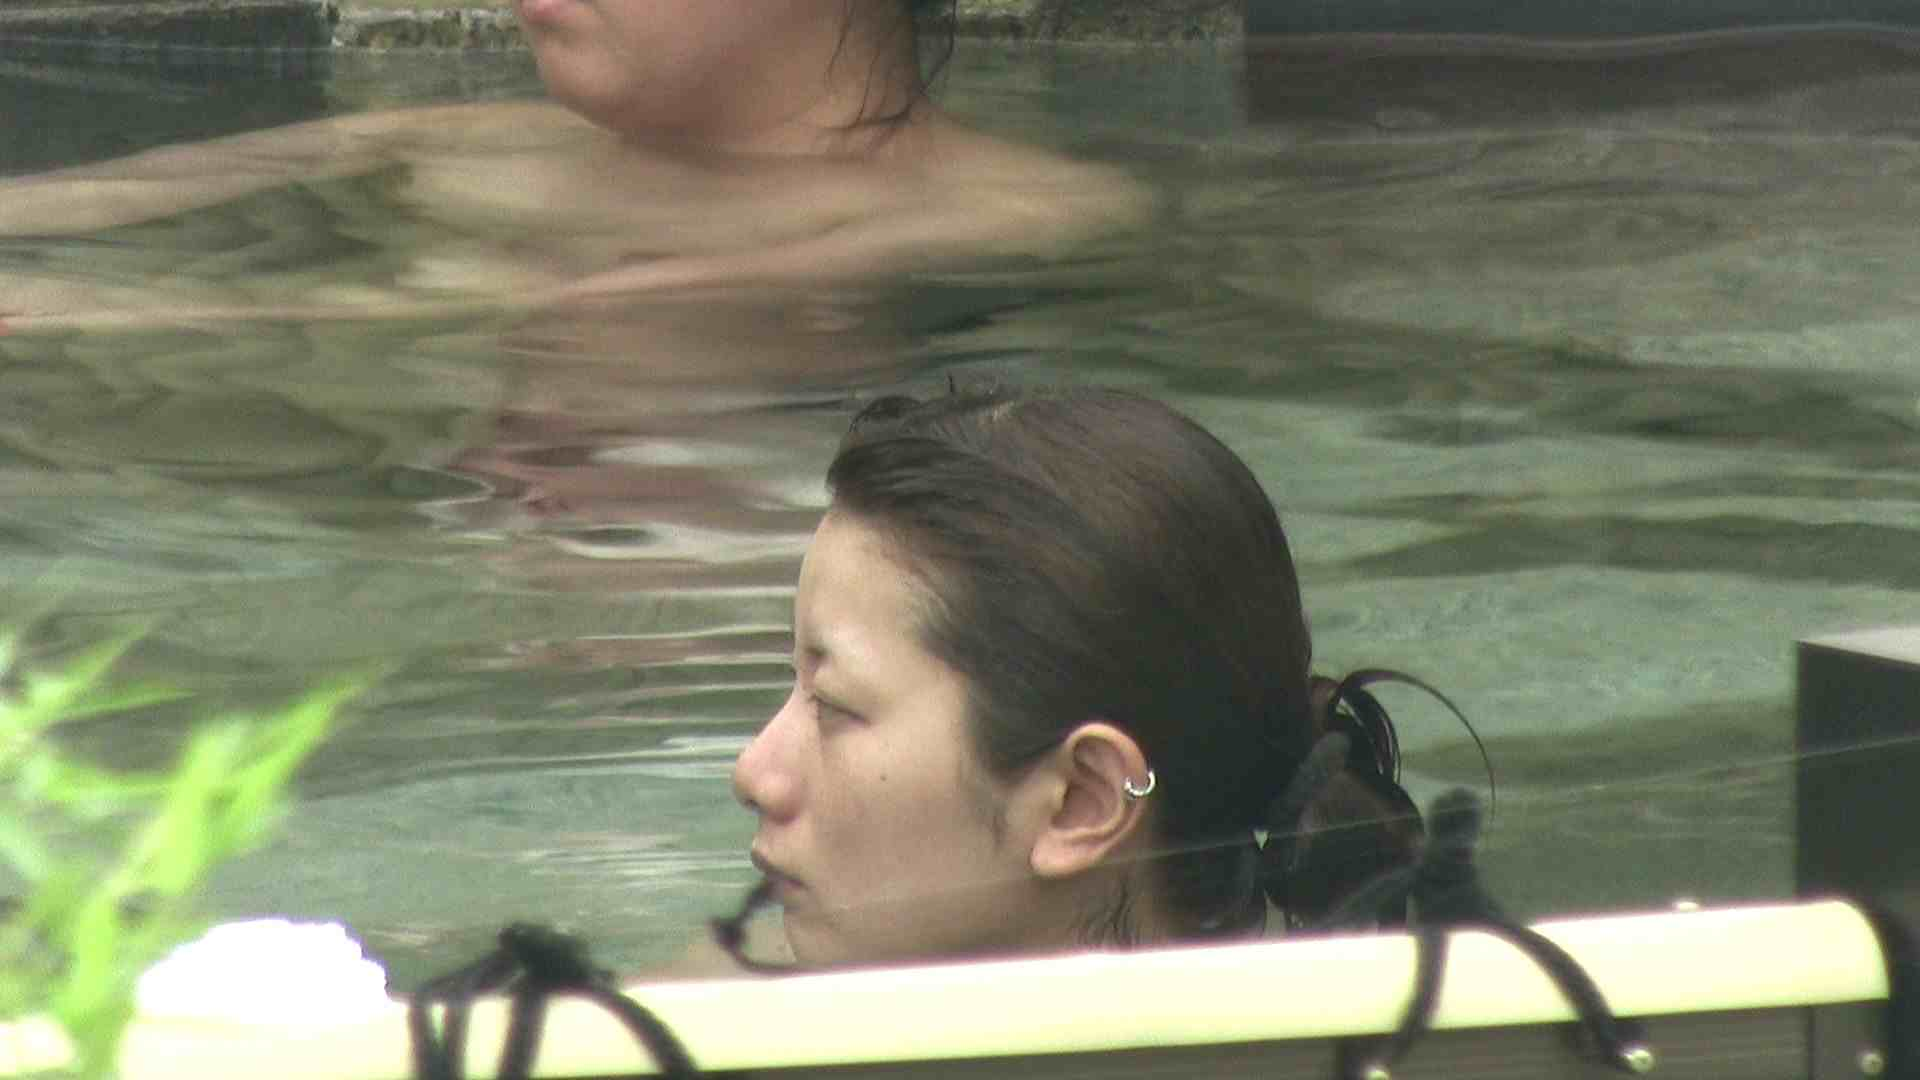 Aquaな露天風呂Vol.19【VIP】 露天風呂突入 AV無料動画キャプチャ 106pic 74